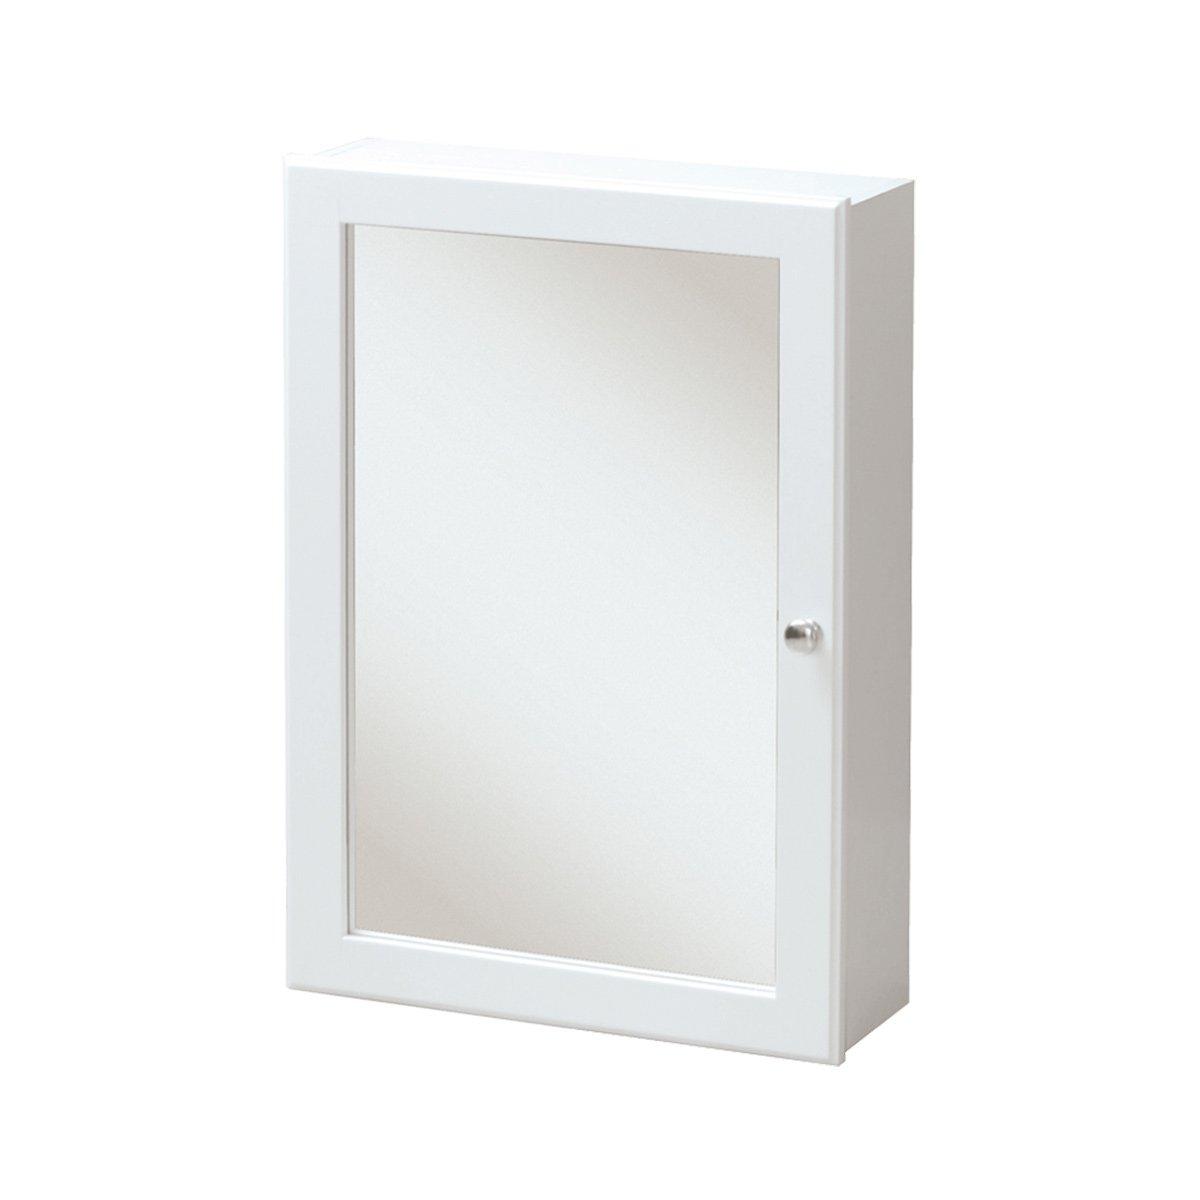 around medicine revista white recessed of cabinet a how image sede design caulk